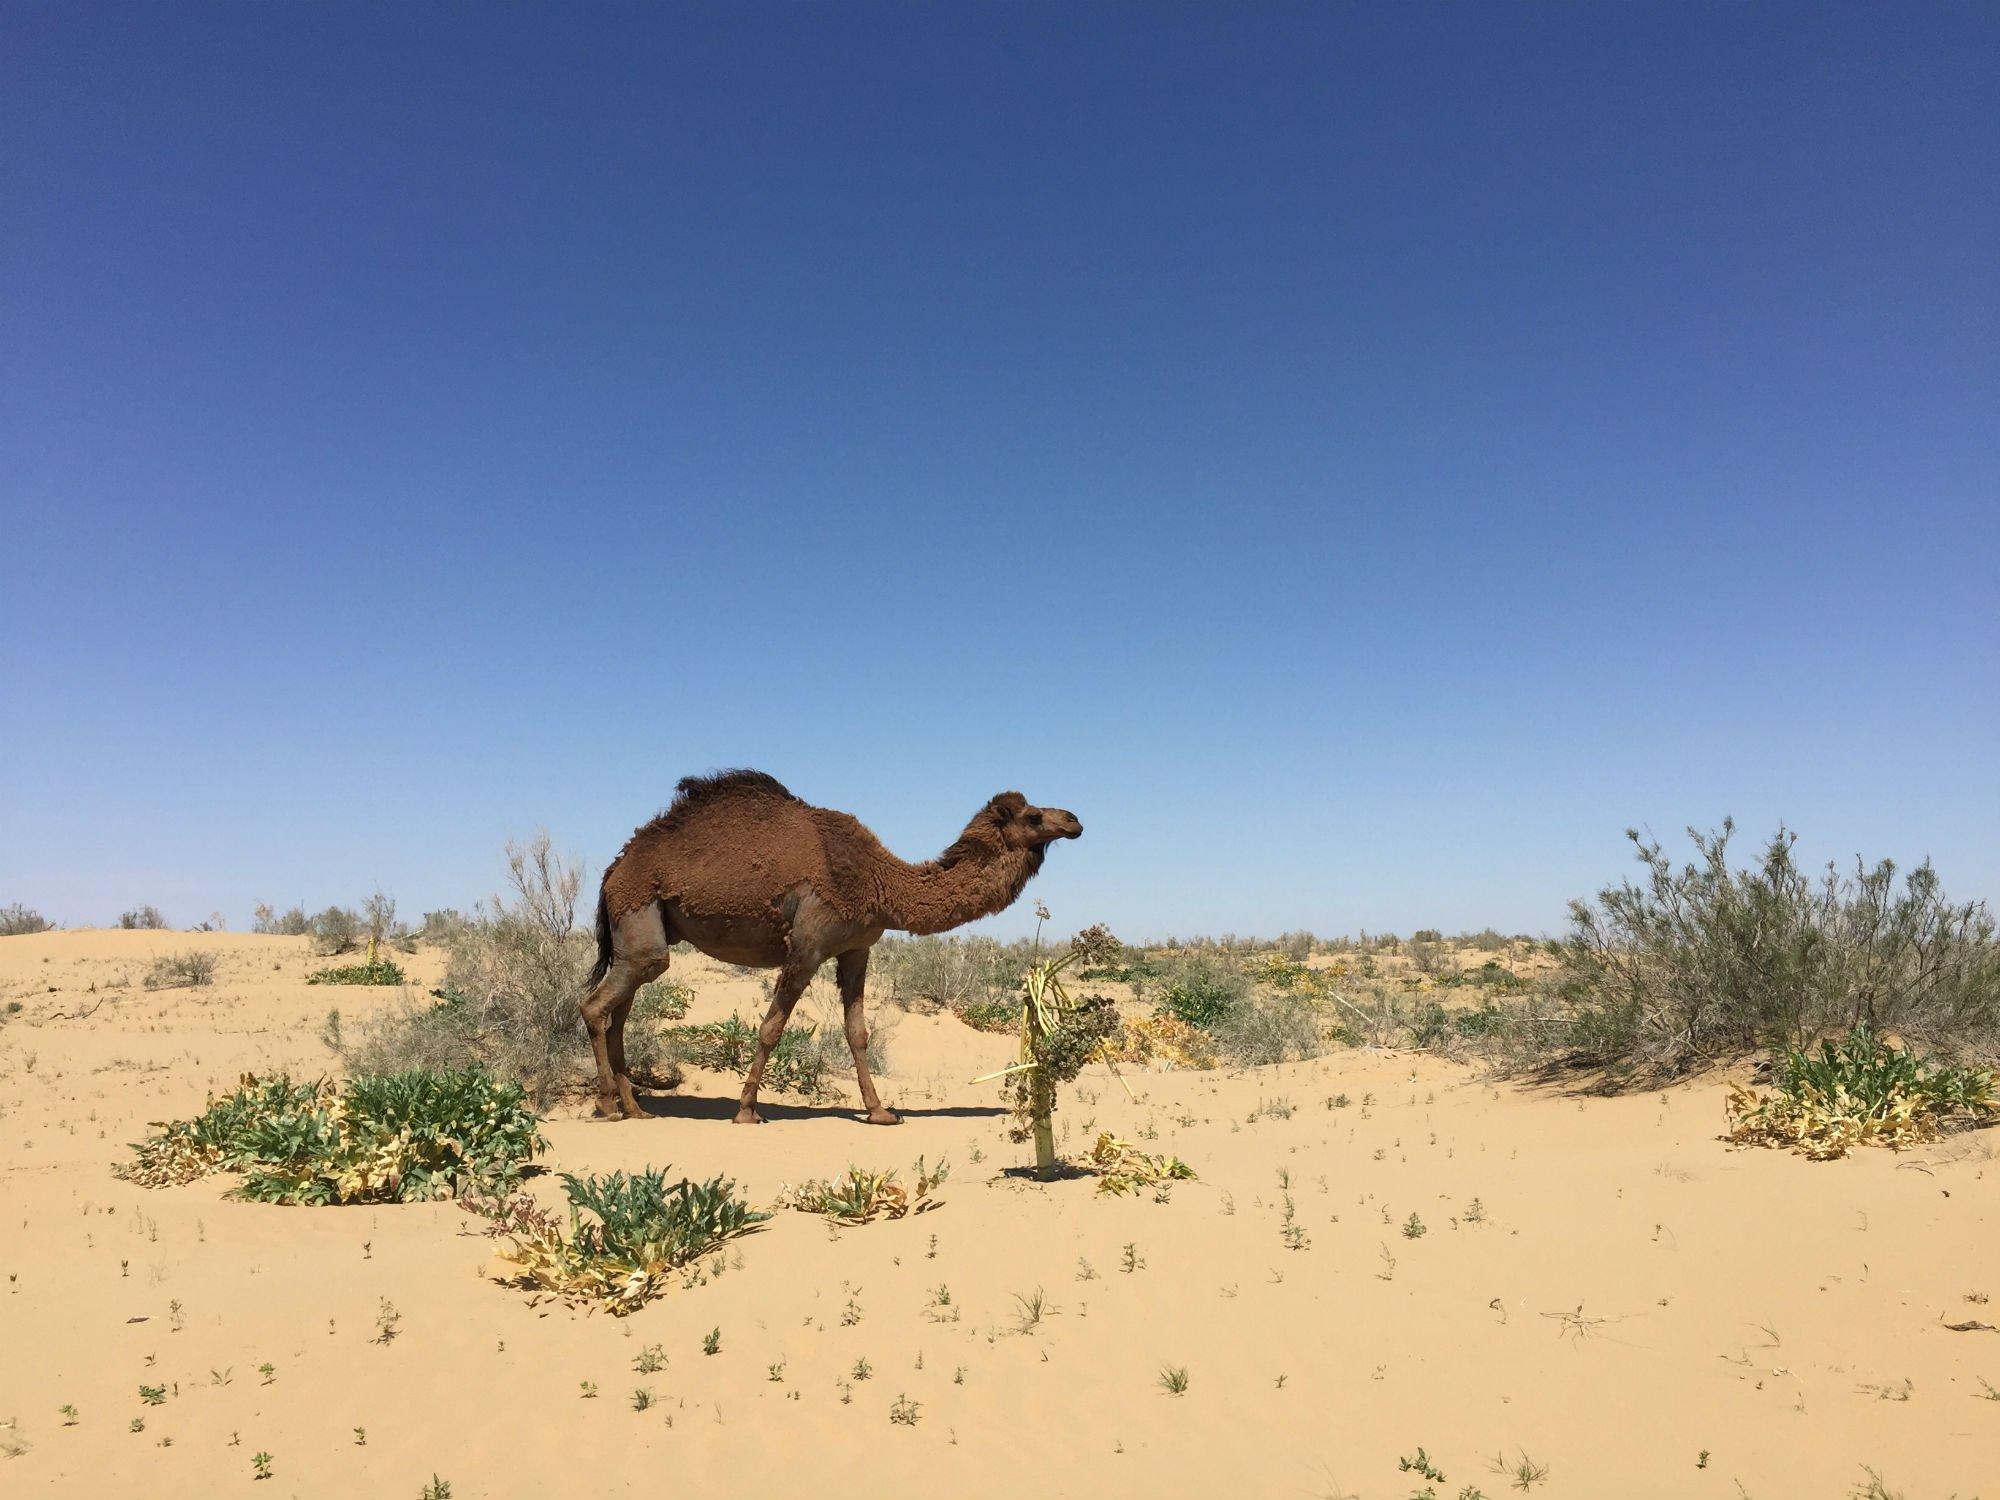 UZBEKISTAN Khiva fortezze nel deserto1 VIAGGIO IN UZBEKISTAN